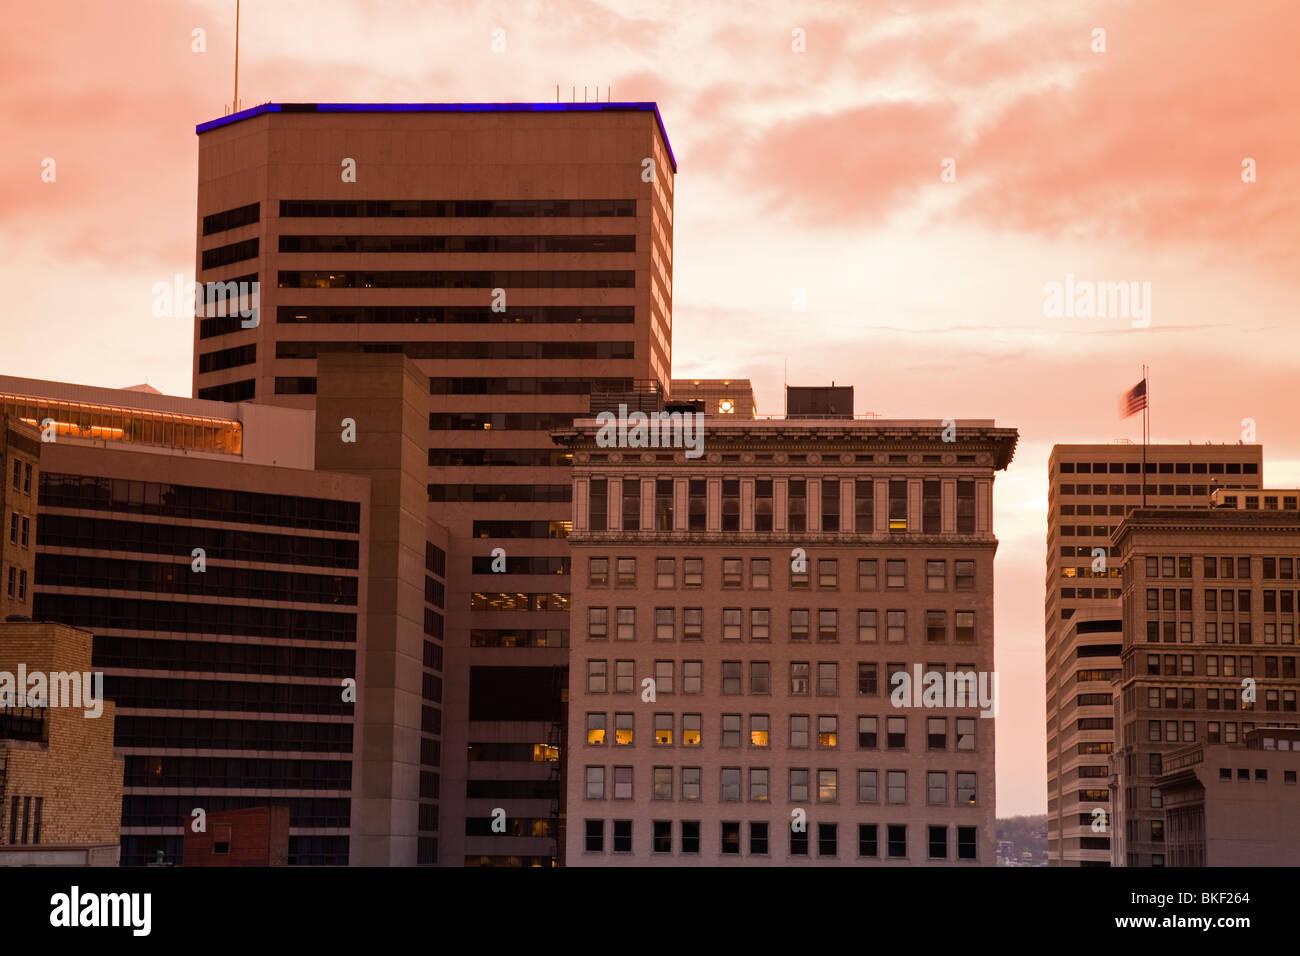 Architecture of Cincinnati, Ohio Stock Photo